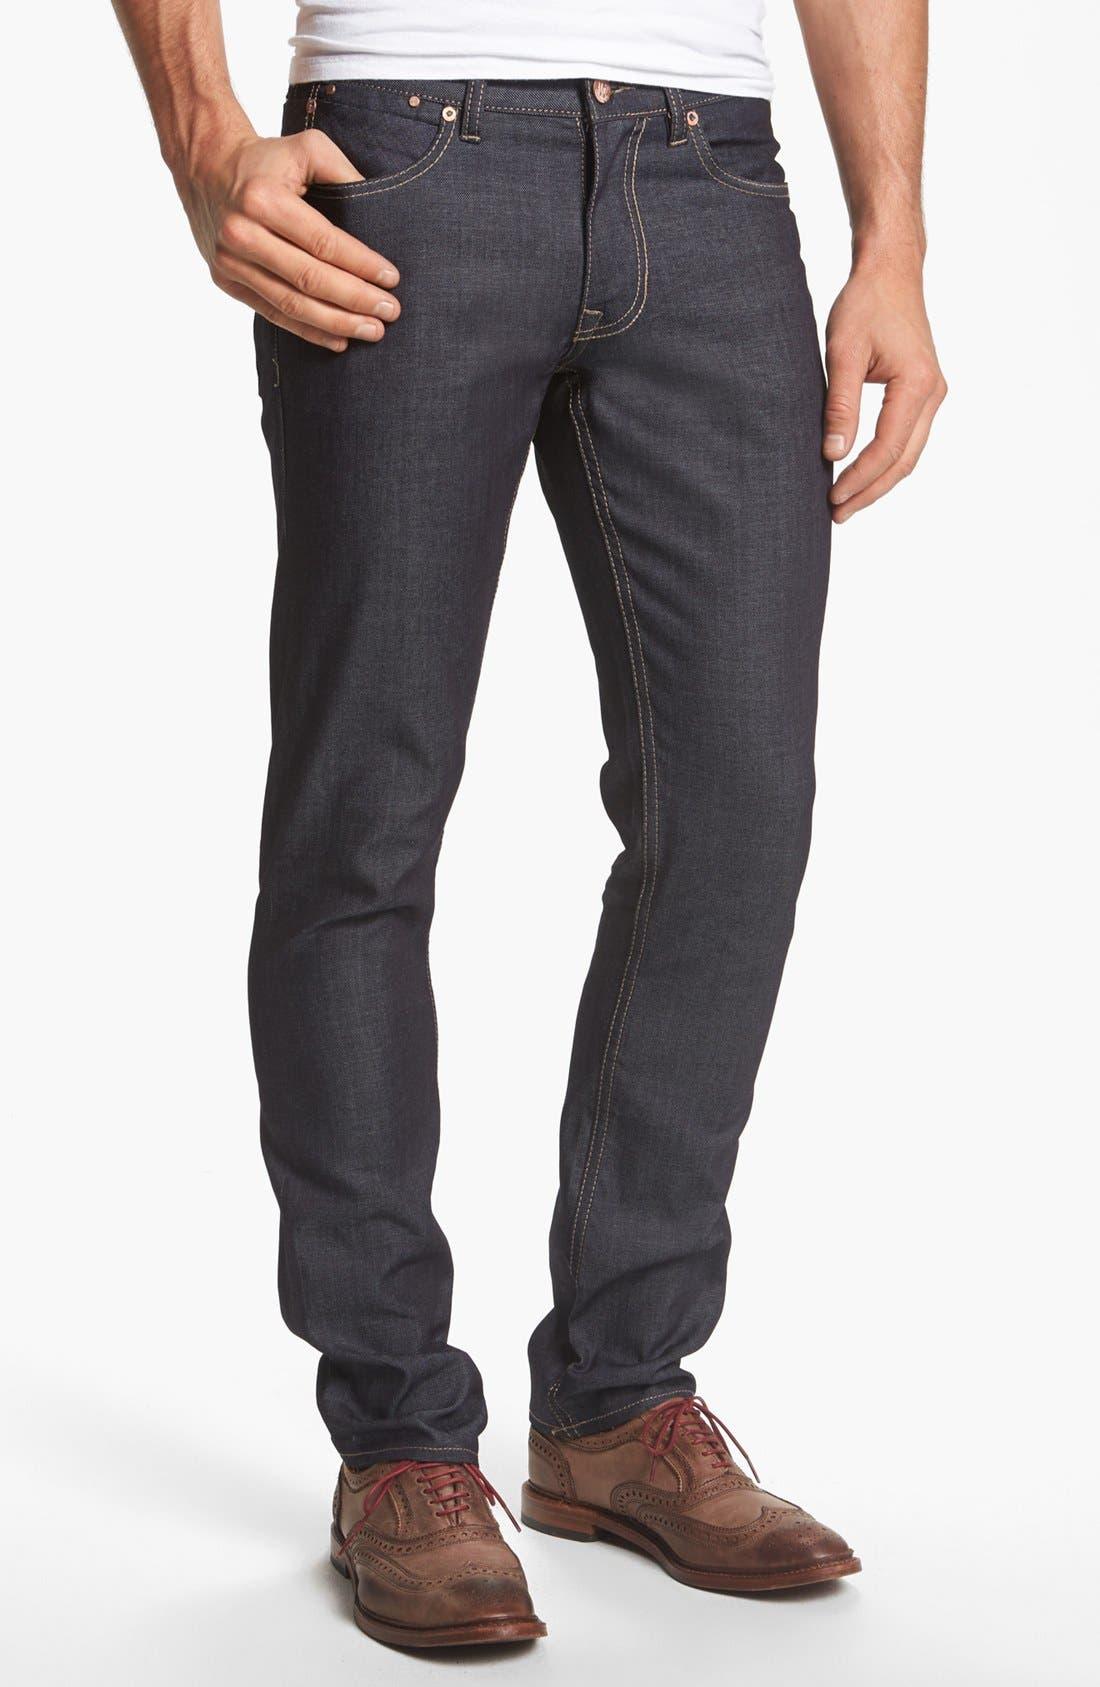 Alternate Image 1 Selected - Williamsburg Garment Company Lightweight 'Grand Street' Slim Fit Jeans (Raw)